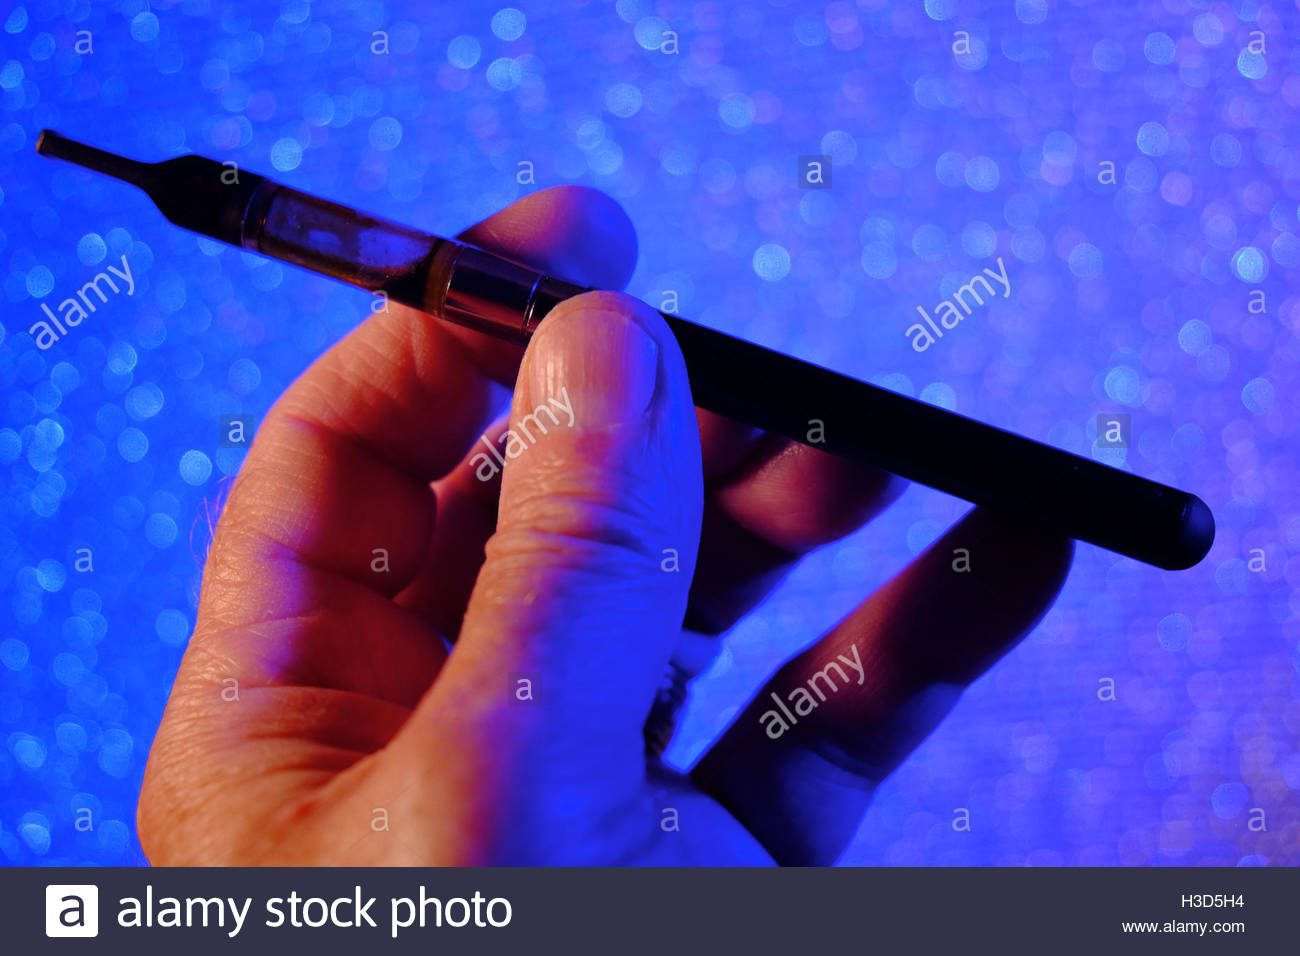 A man holds a vaporizer pen infused with medicinal marijuana. - Stock Image